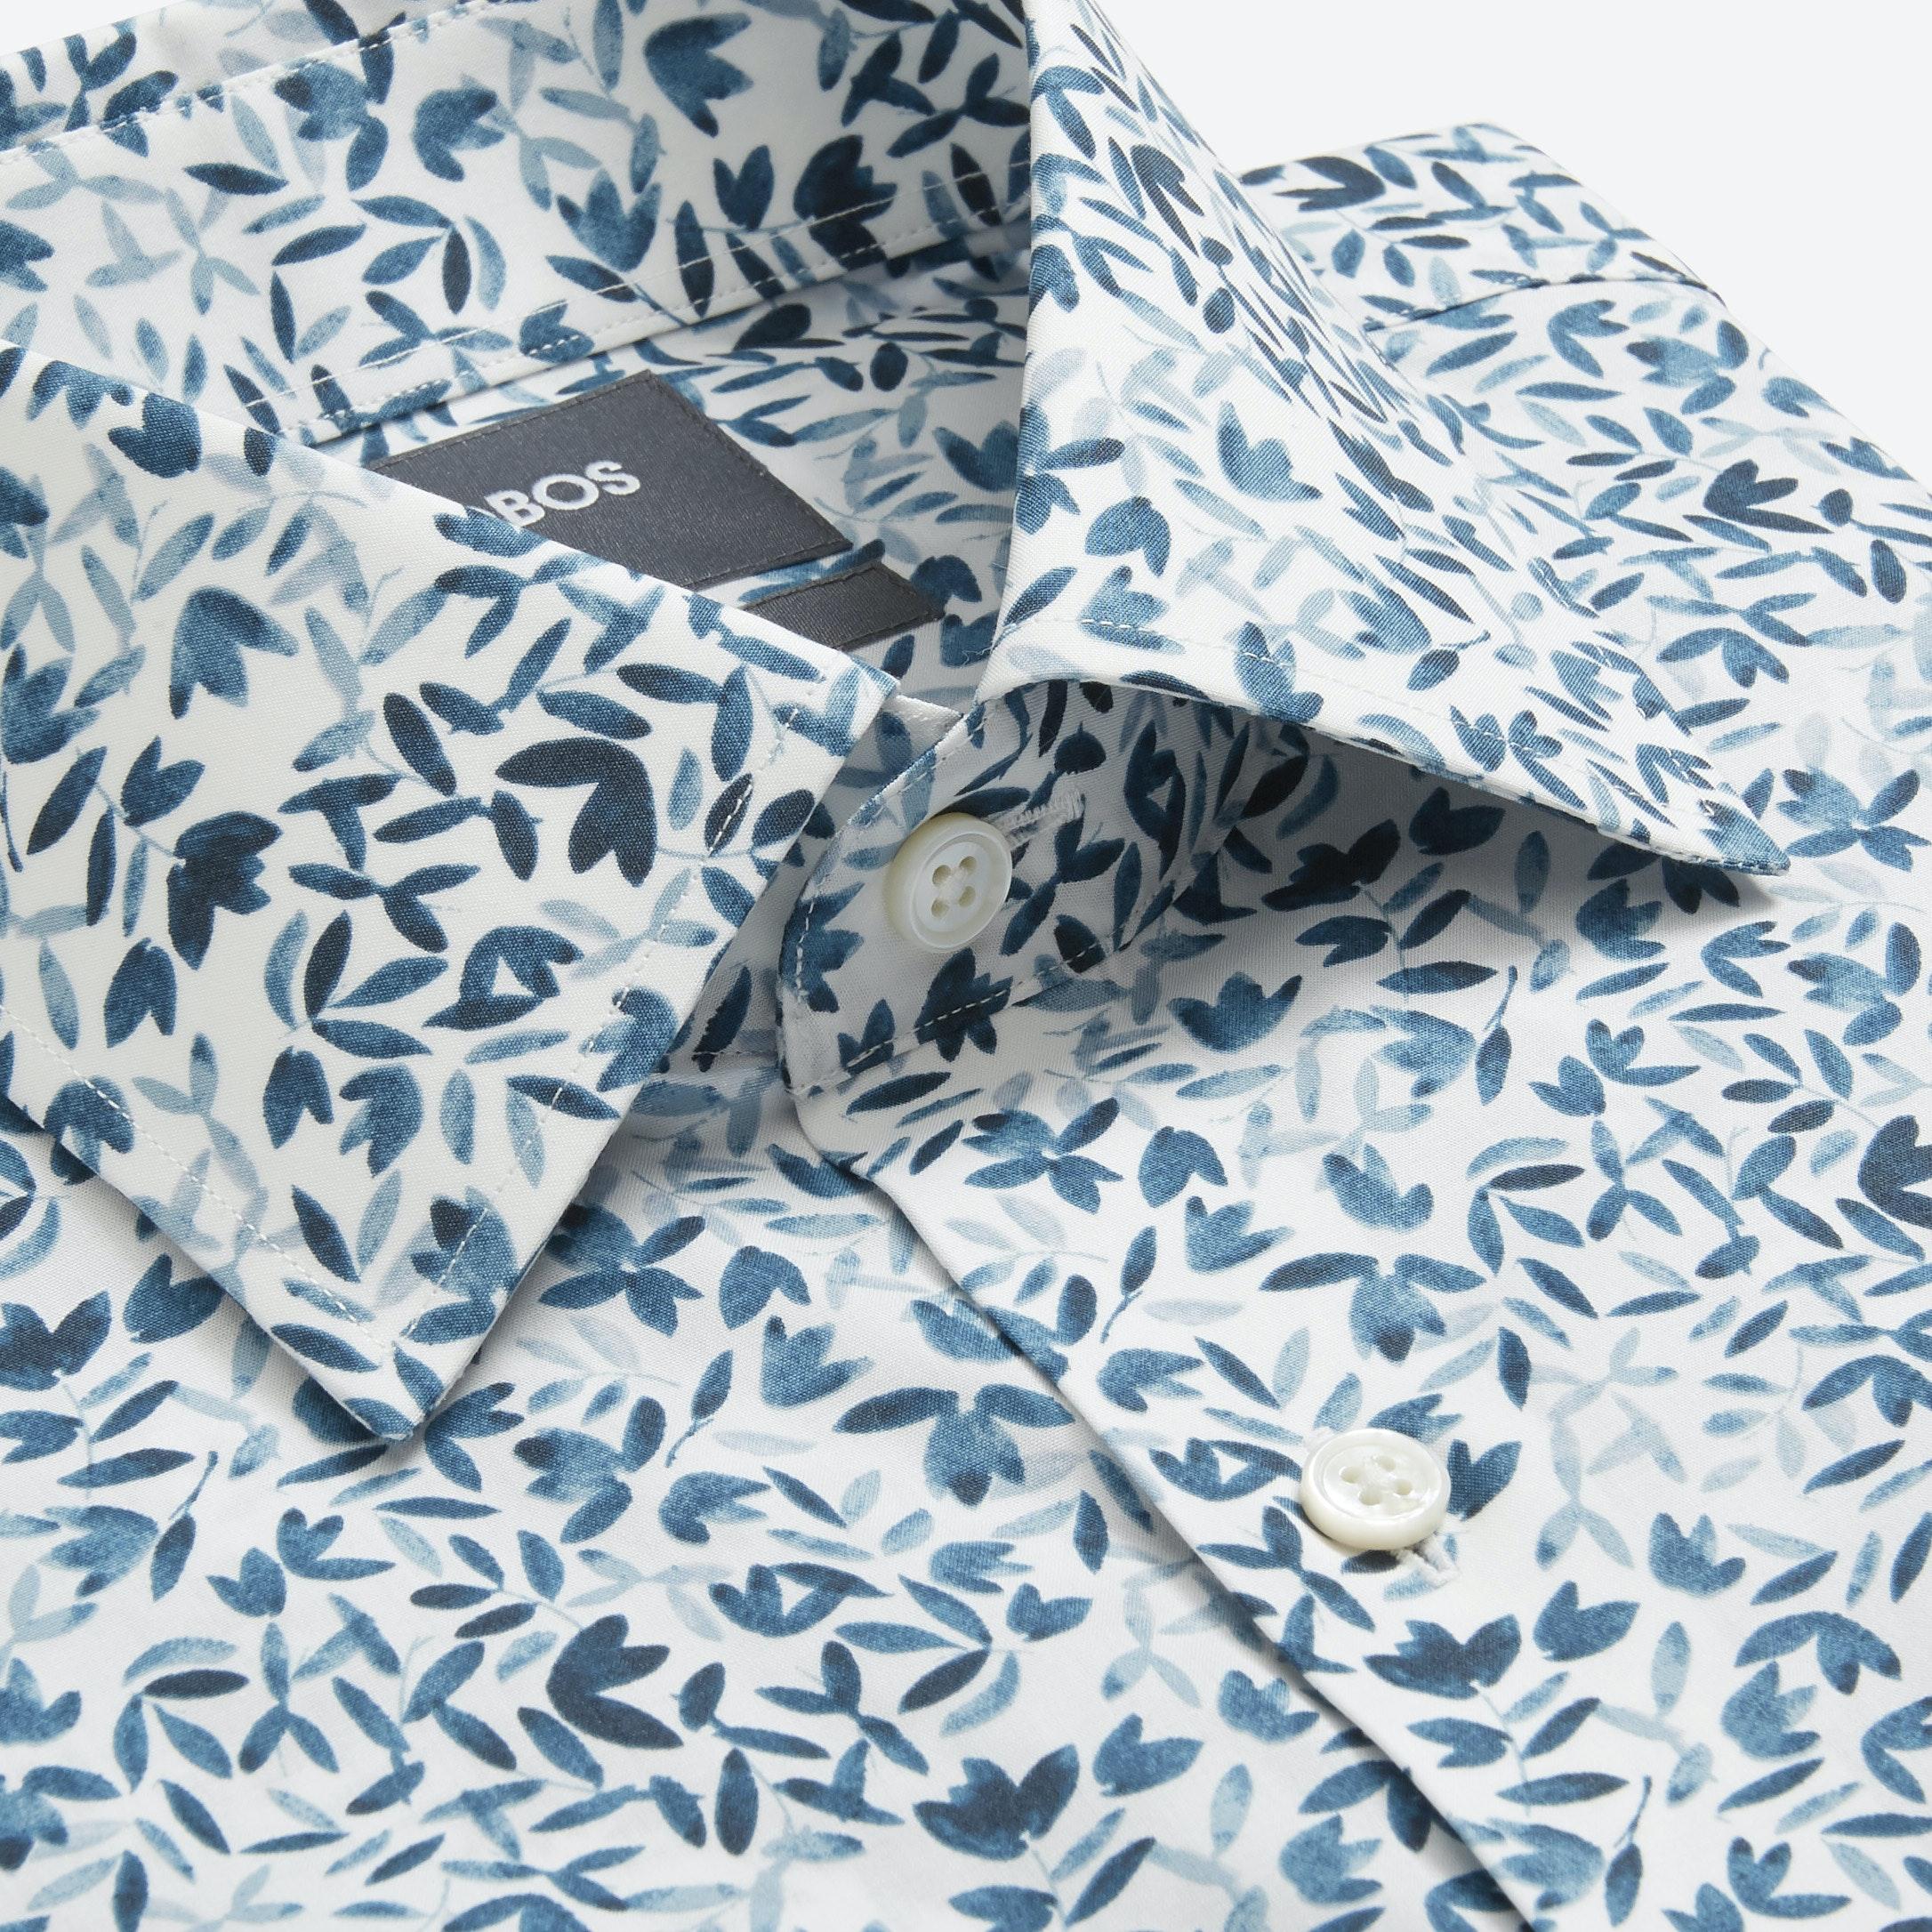 Jetsetter Stretch Dress Shirt Limited Edition